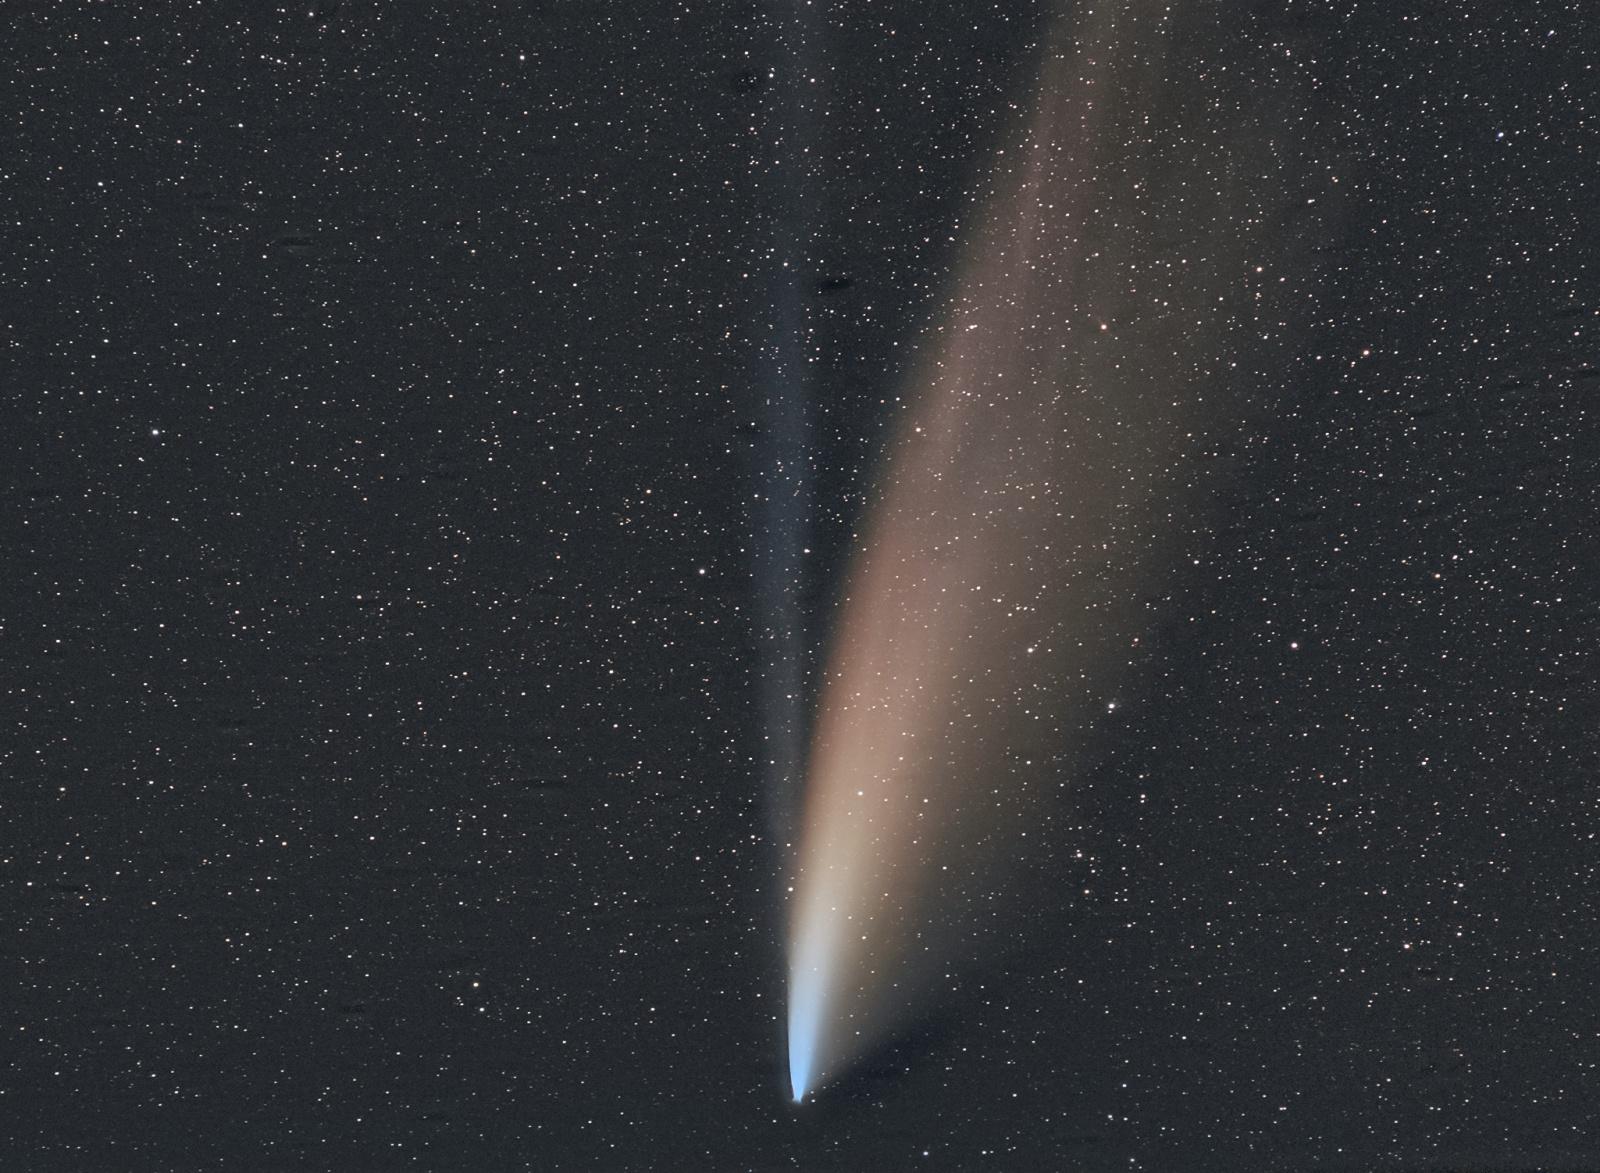 kometa_2-2.thumb.jpg.f11c393f05df7390569c73161bc650be.jpg